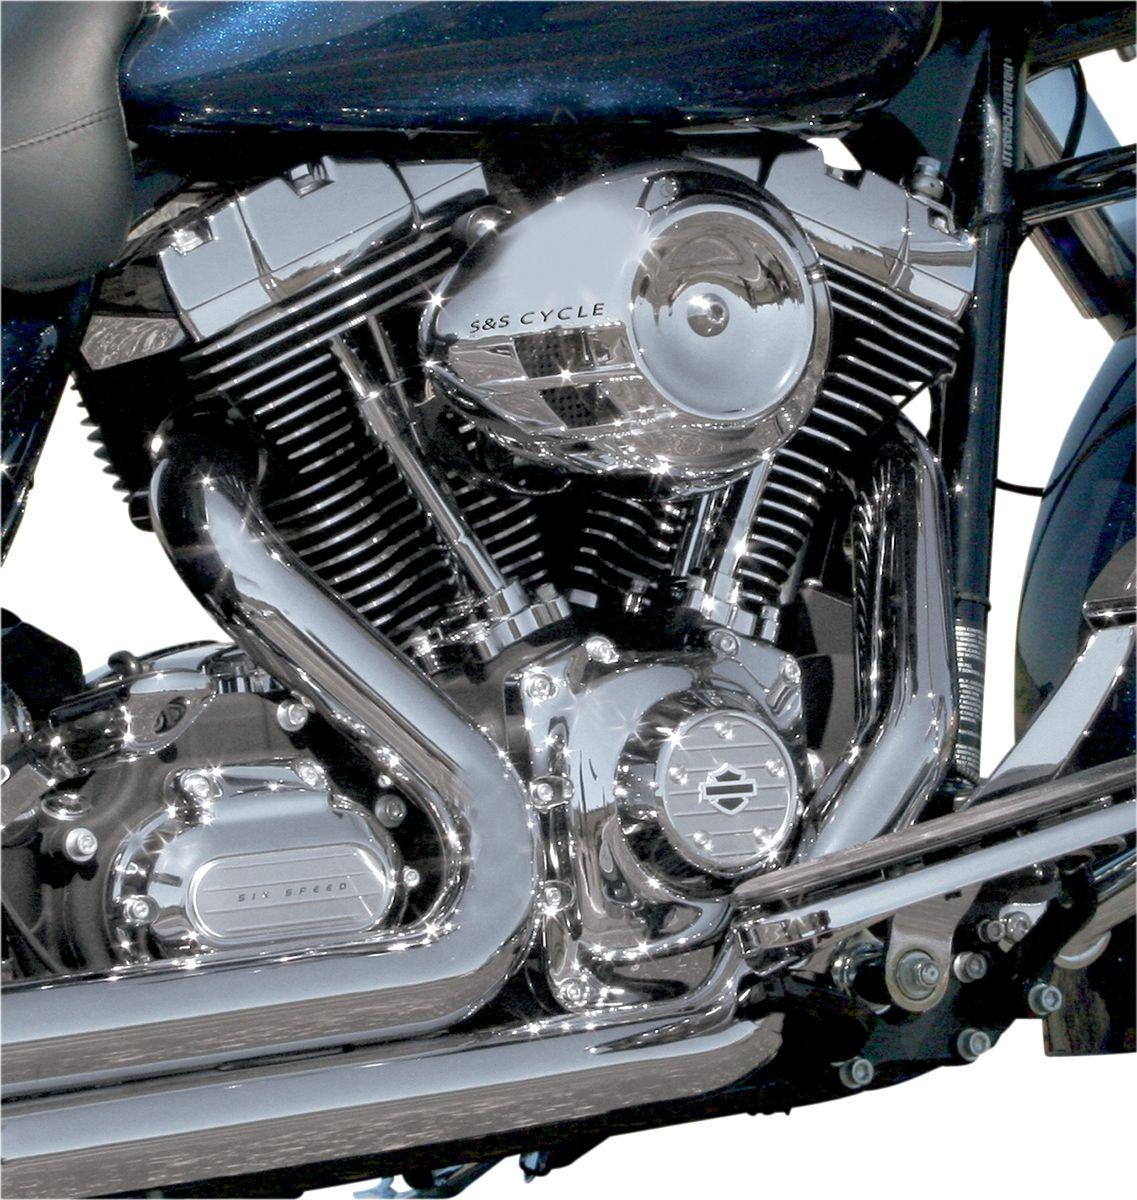 【S&S CYCLE】空氣濾清器蓋/鍍鉻 【COVER AIR STRM CHR [1014-0116]】 - 「Webike-摩托百貨」